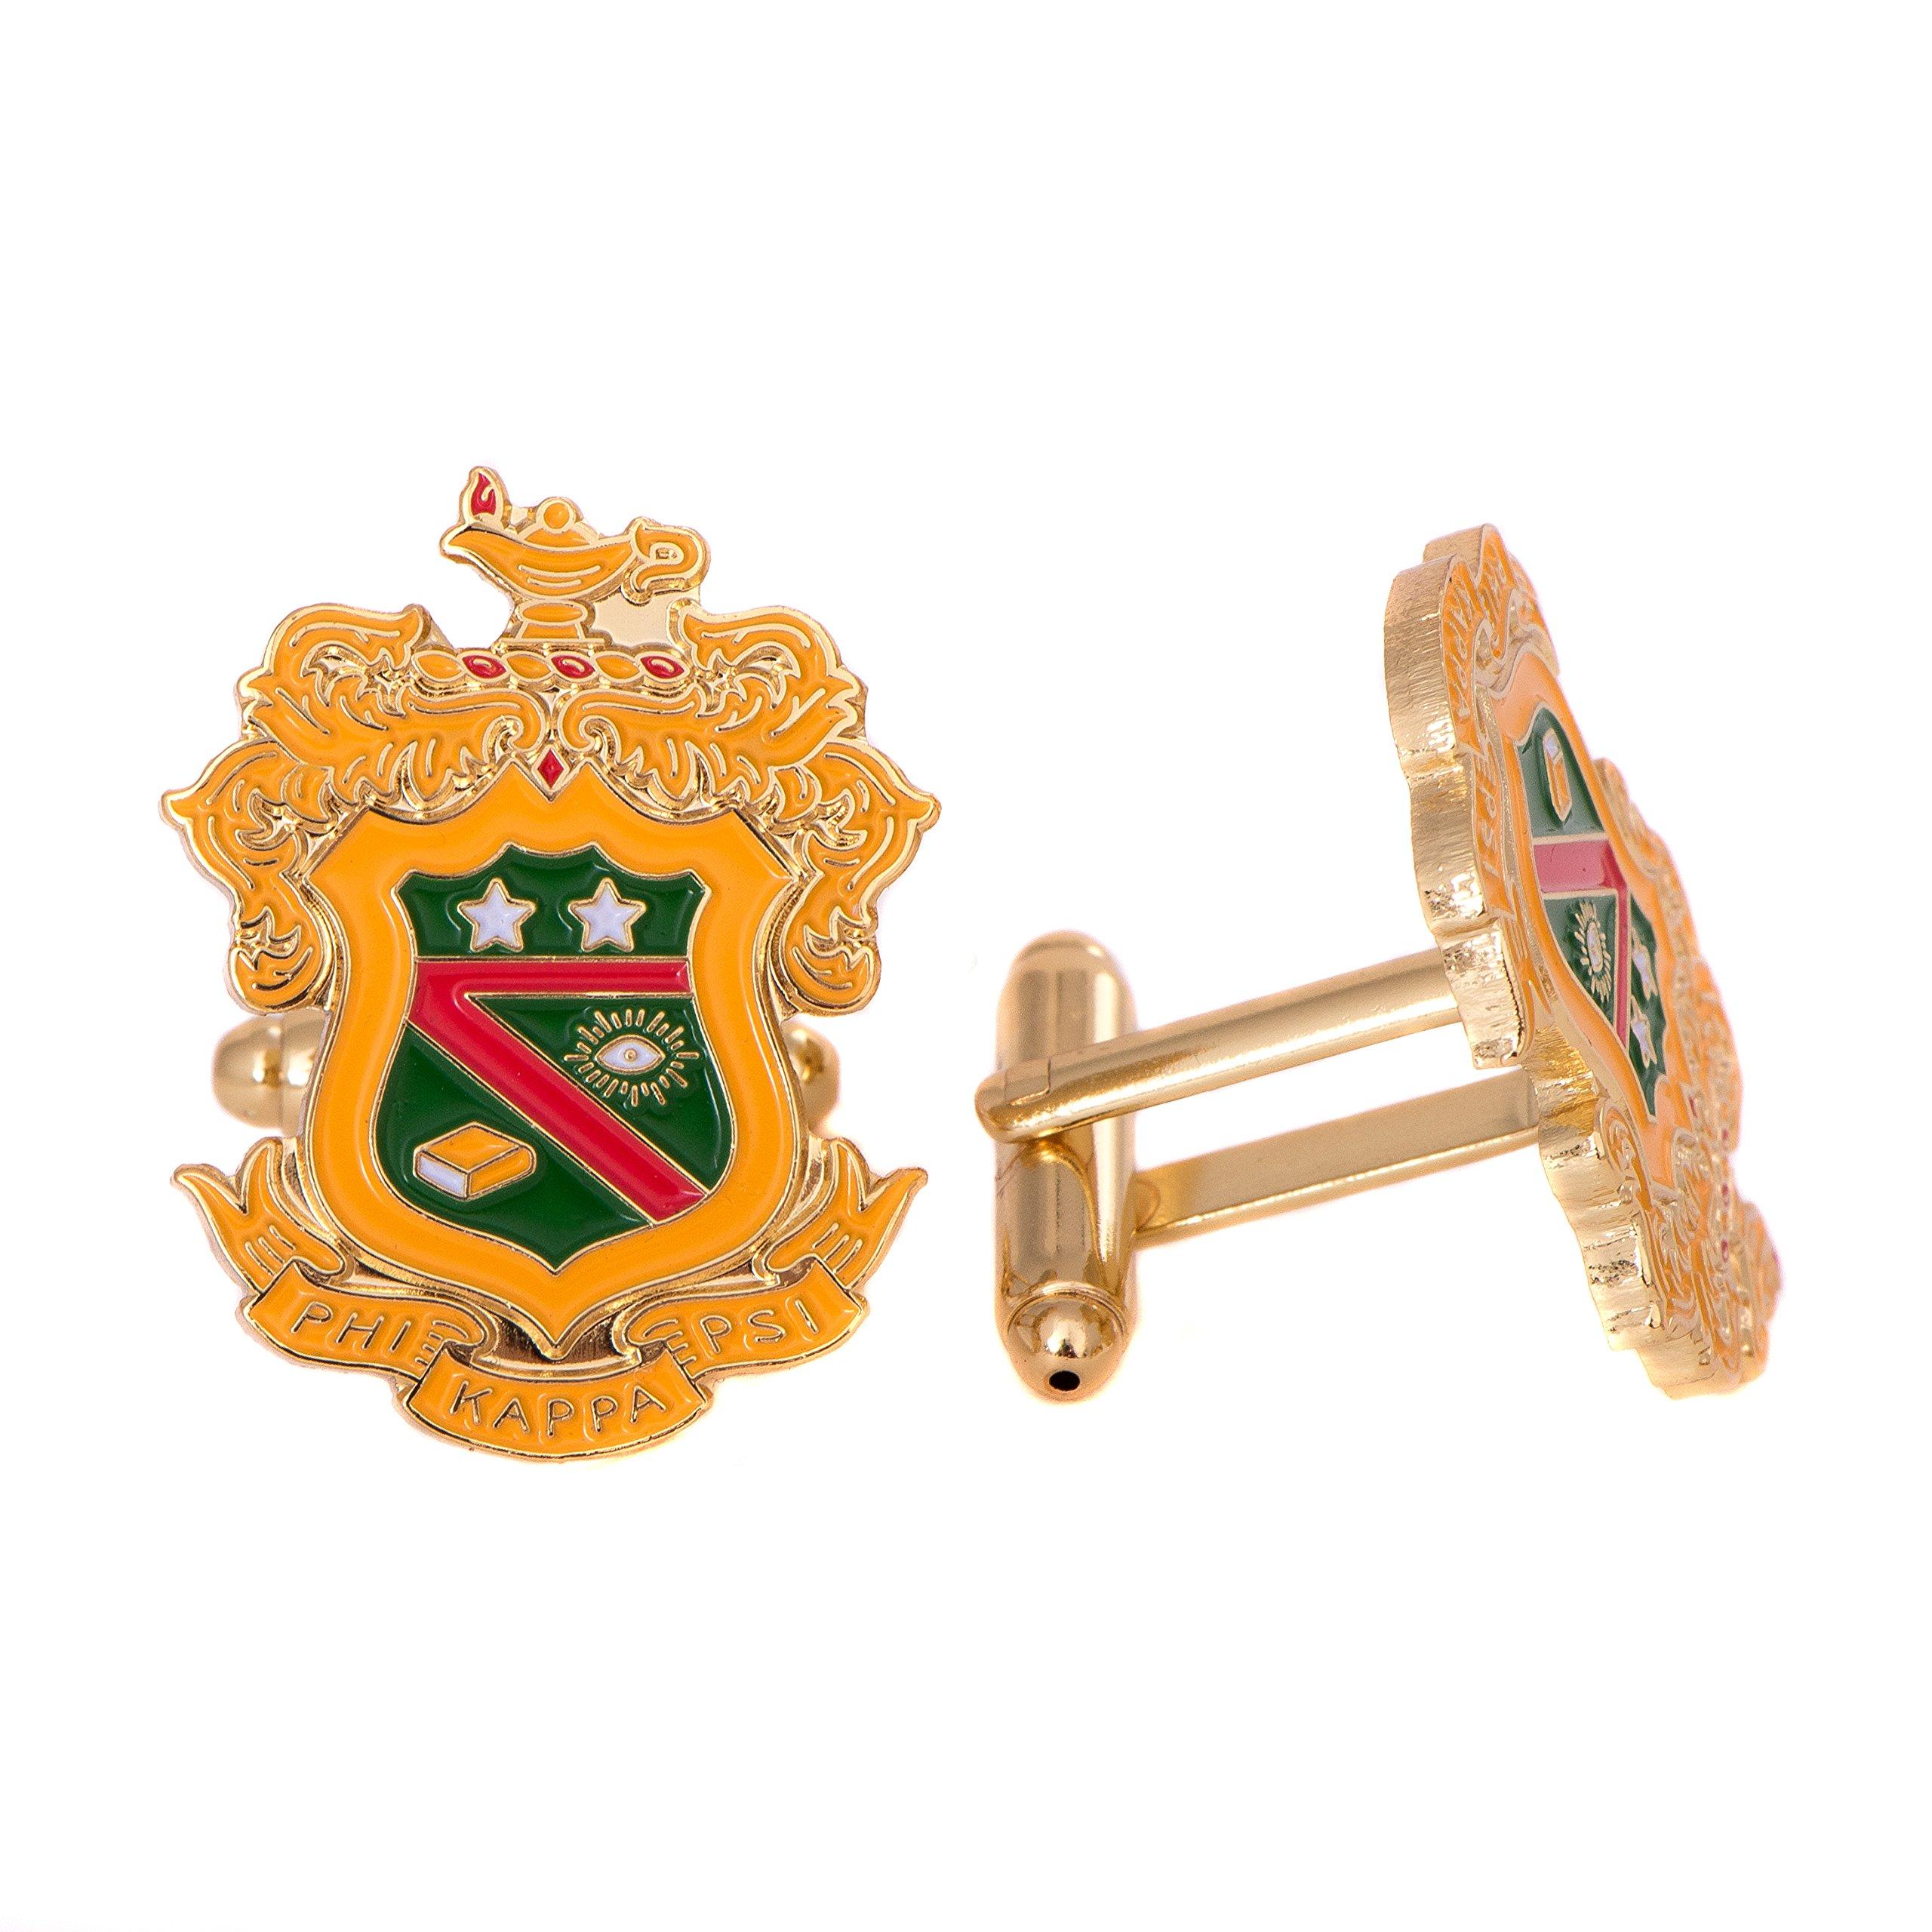 Desert Cactus Phi Kappa Psi Fraternity Crest Cufflinks Greek Formal Wear Blazer Jacket